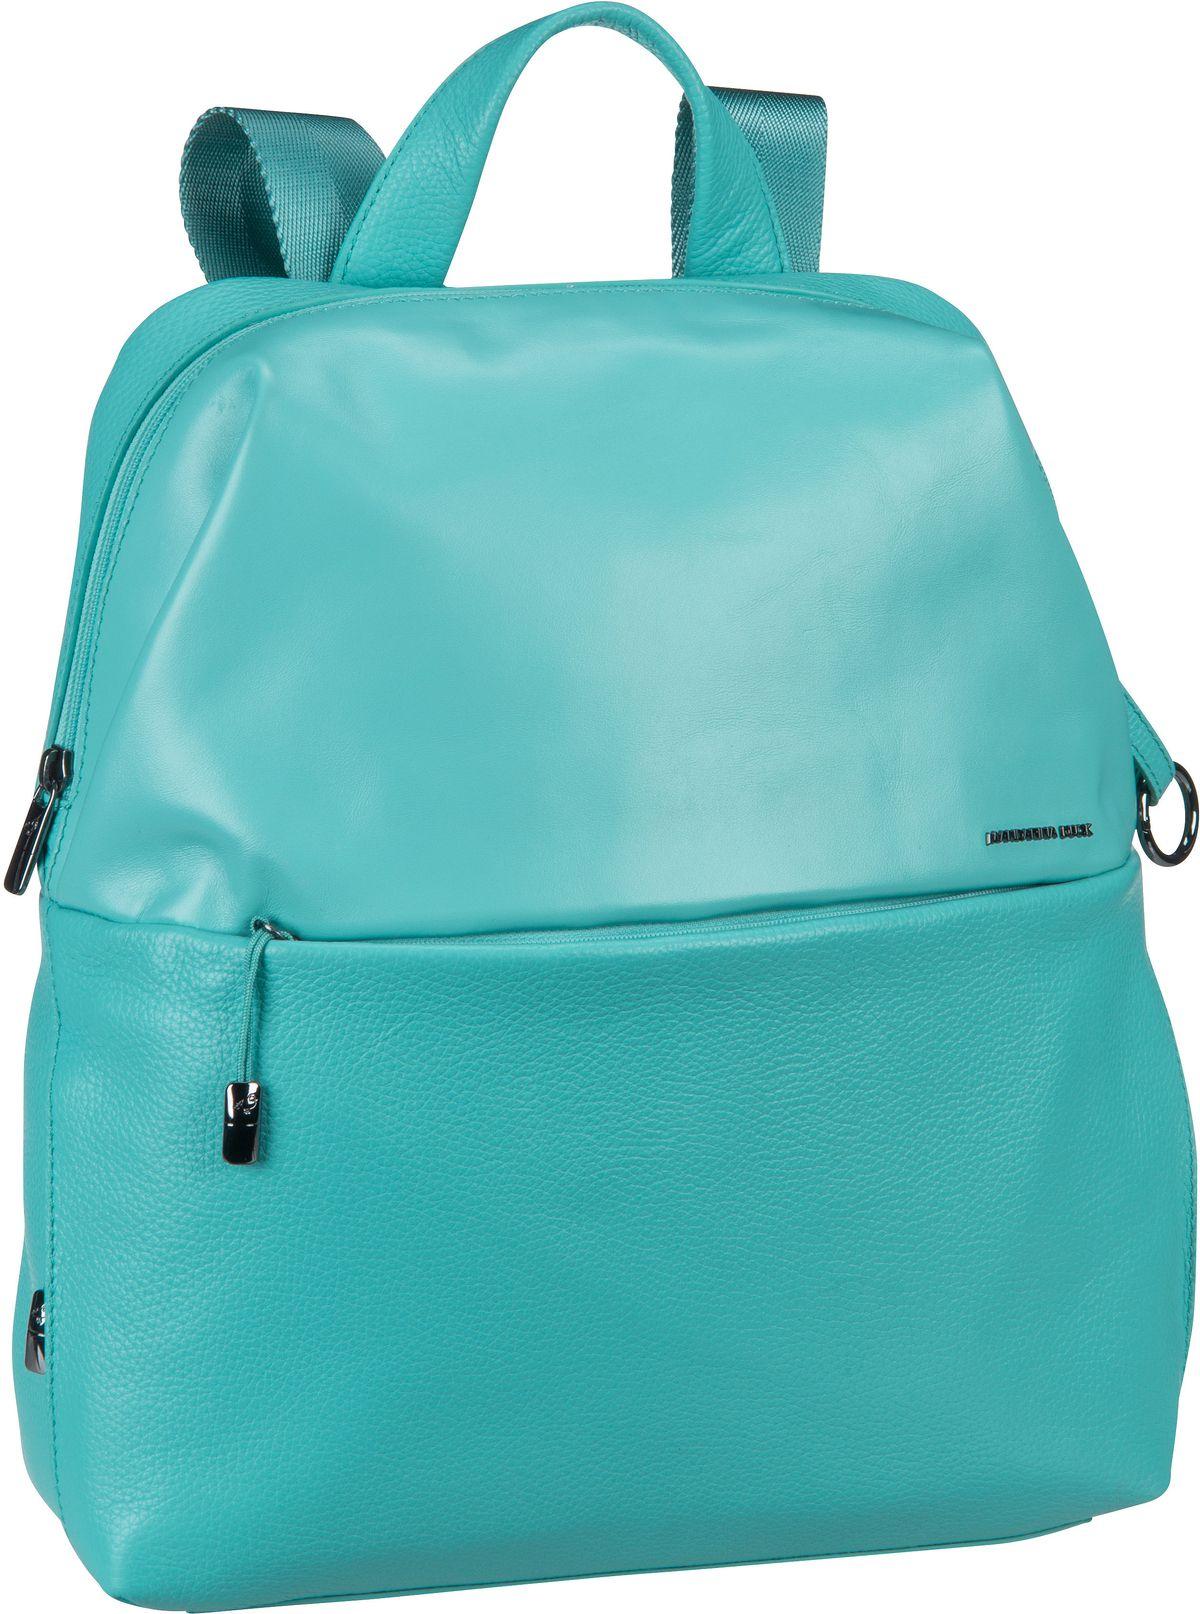 Rucksack / Daypack Athena Backpack UPT10 Baltico